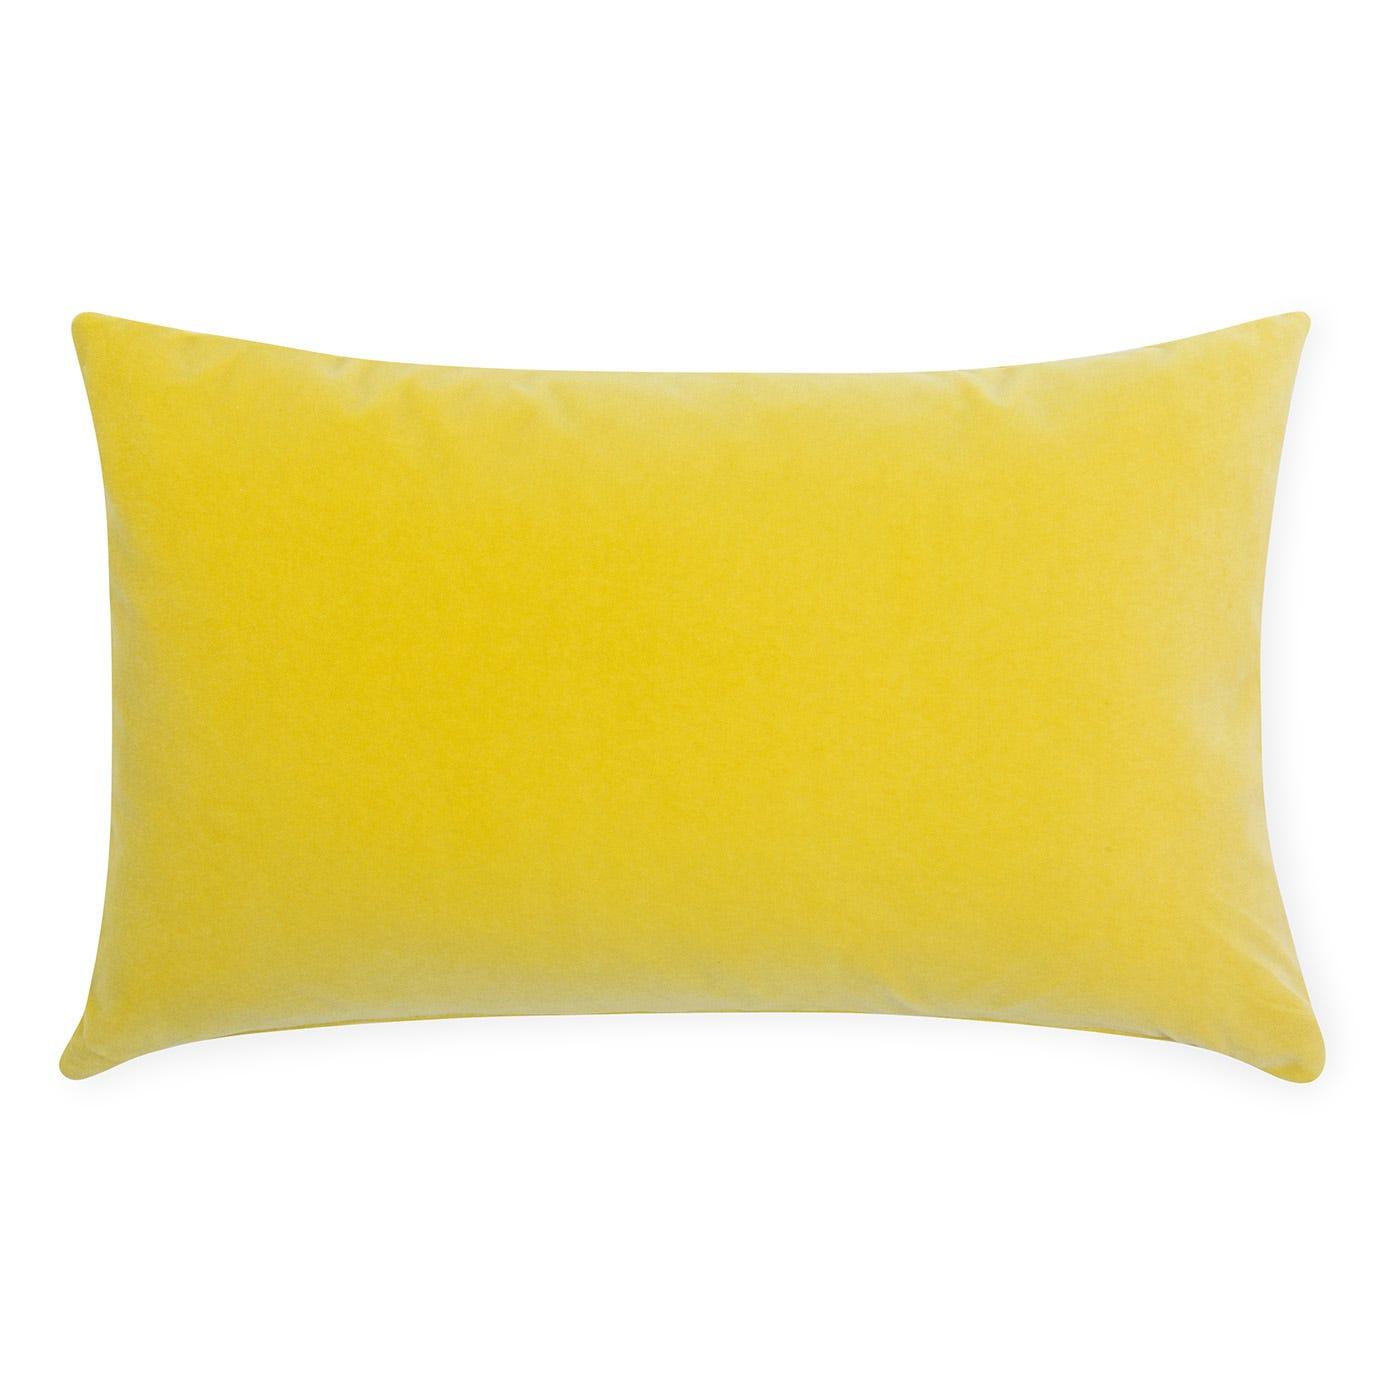 Varese Cushion Alchemilla 35 X 55cm